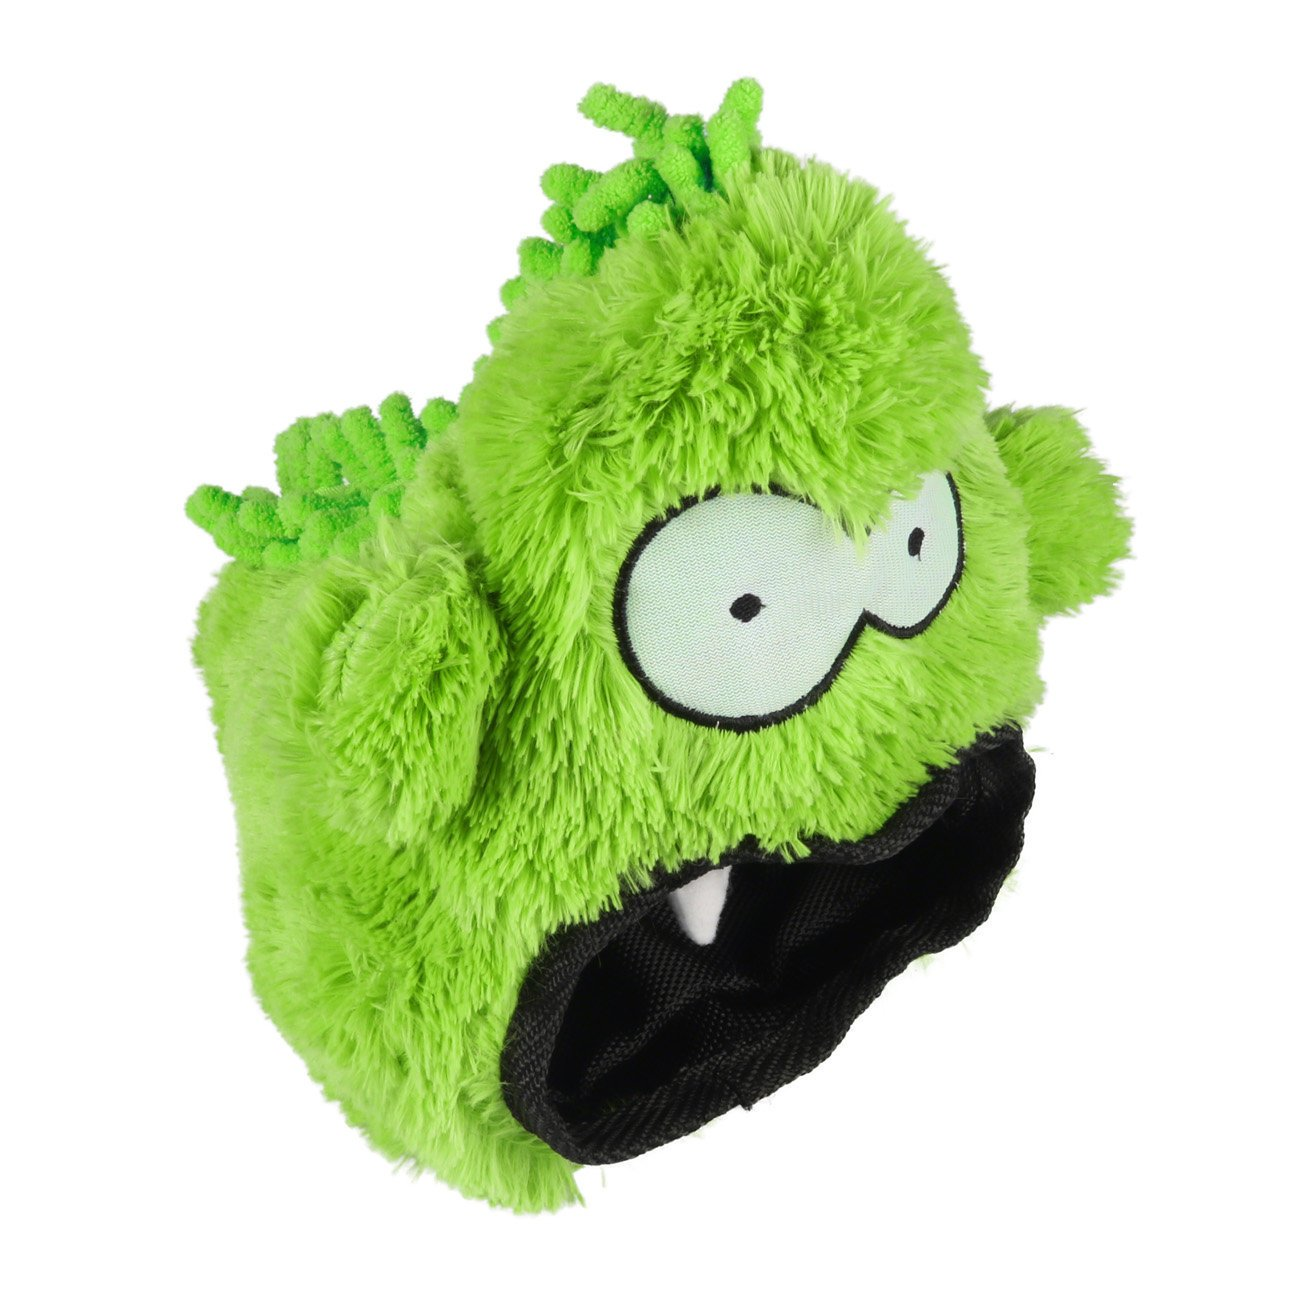 Coockoo Plüsch Monster Hundespielzeug, Bild 10